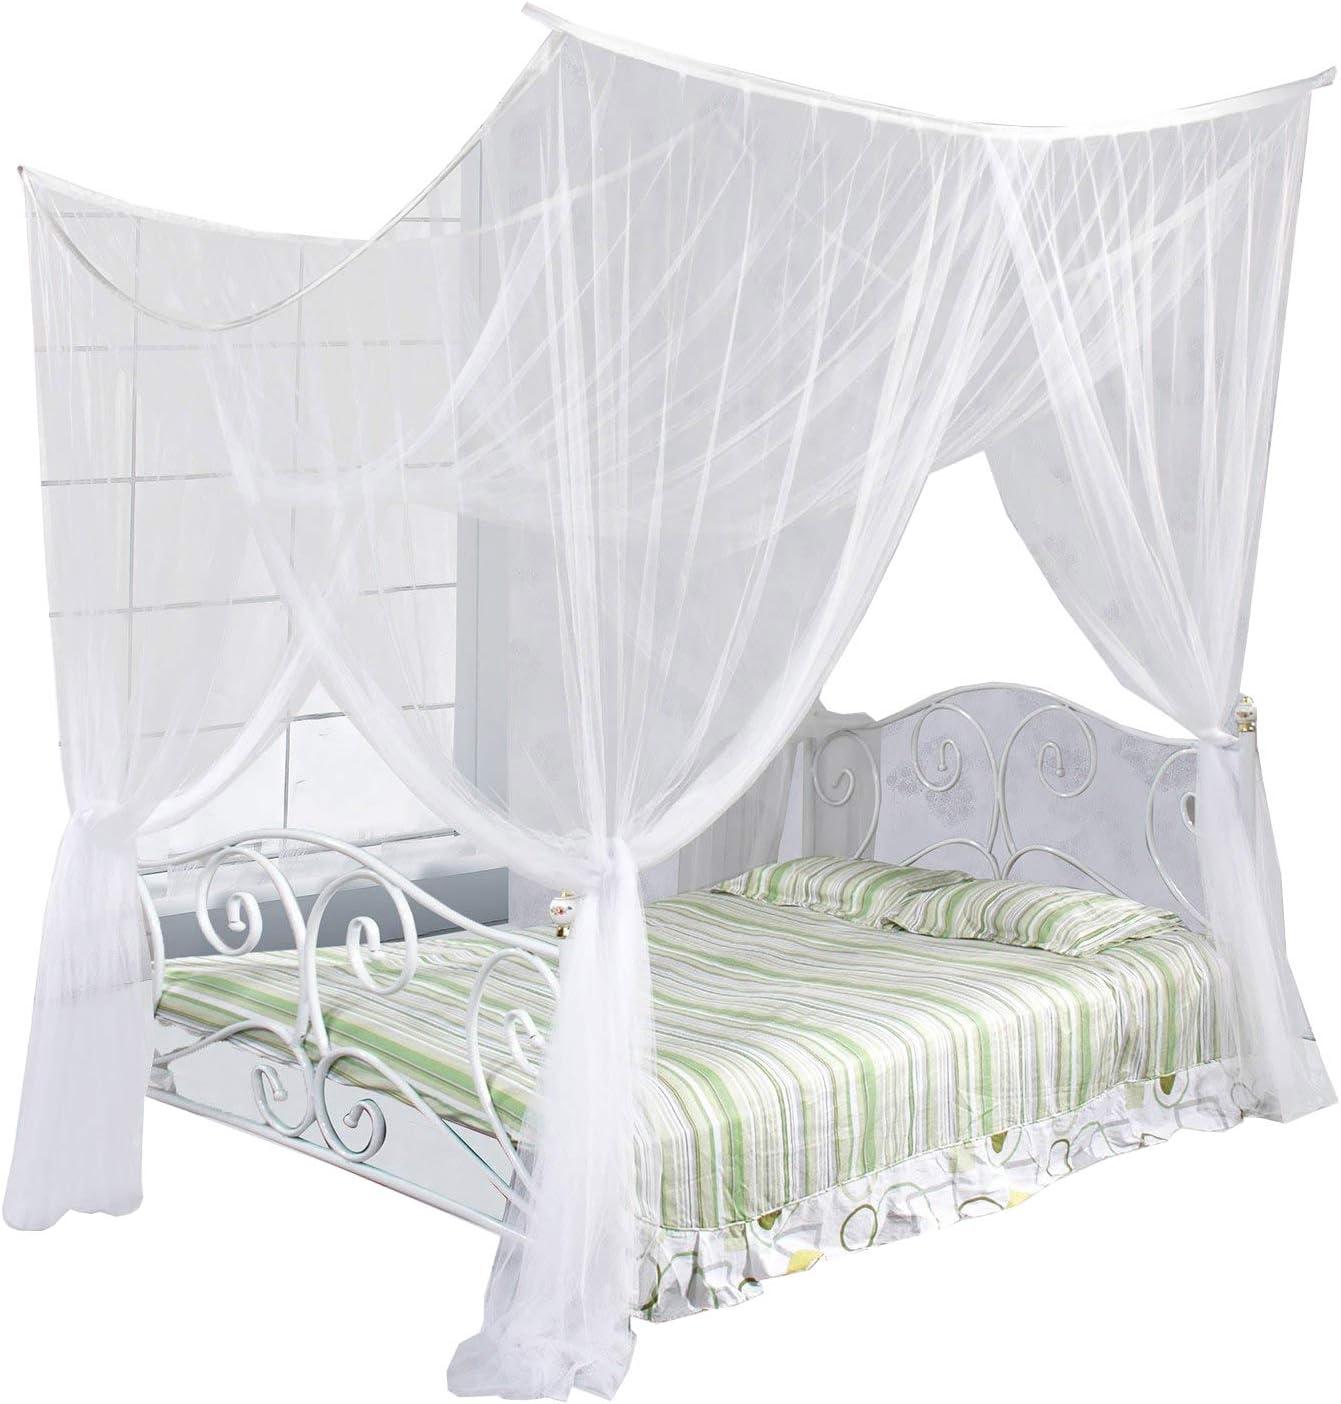 Amazon Com Just Relax Four Corner Post Elegant Mosquito Net Bed